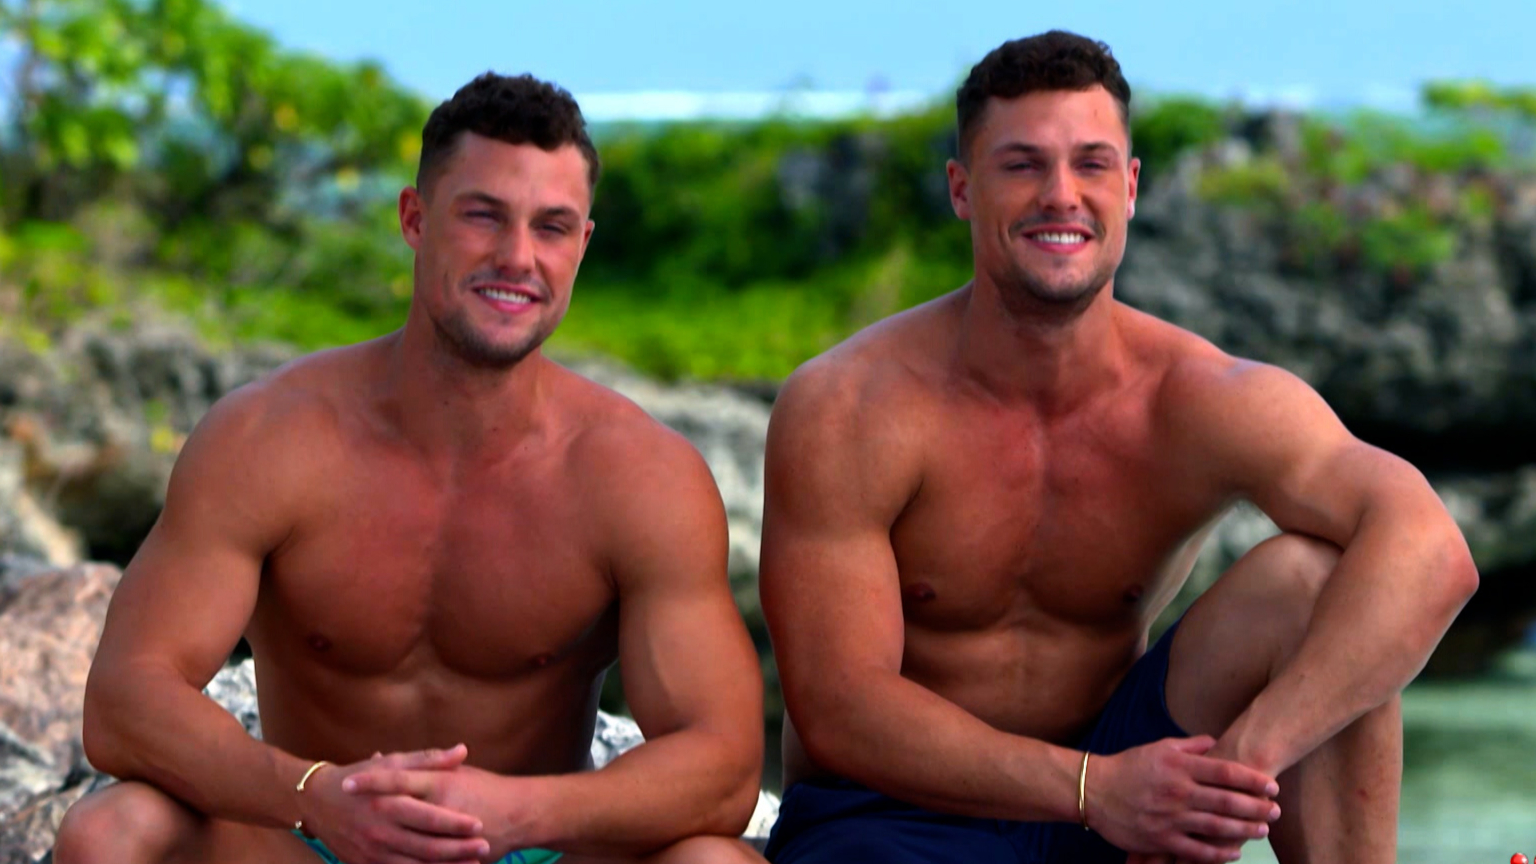 Meet Fan team twins Luke and Josh Packham